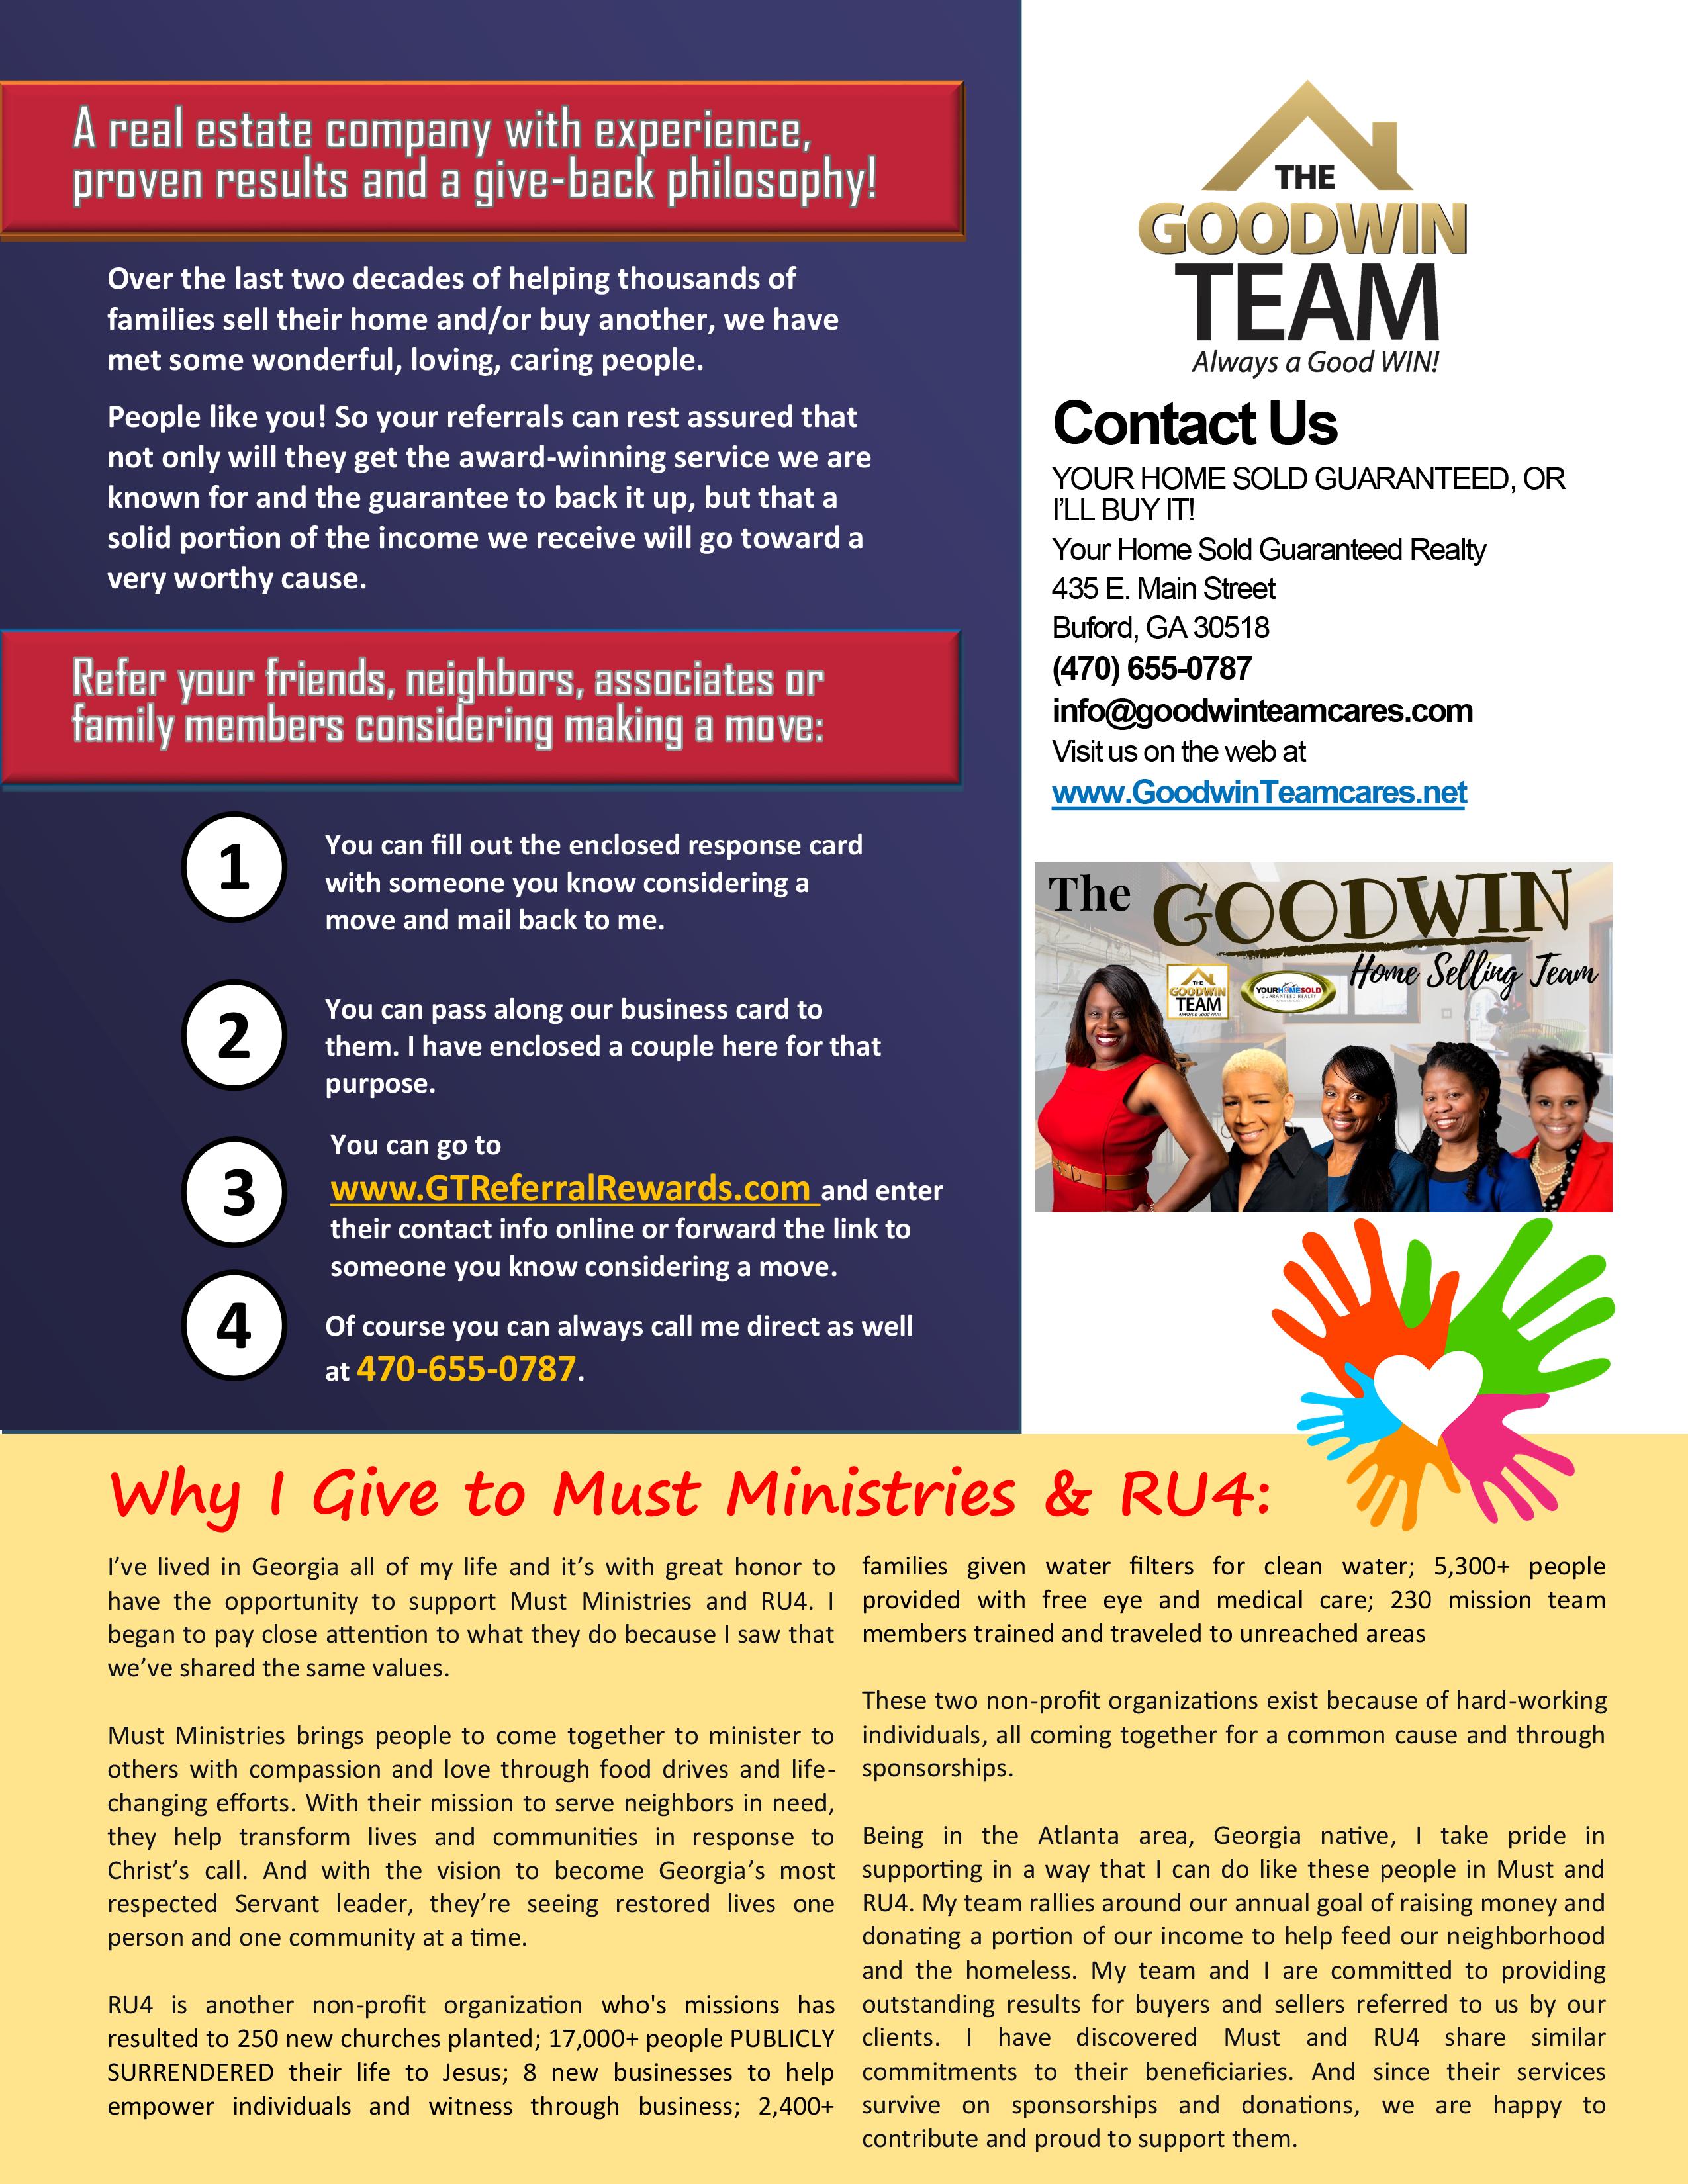 June 2020 Referral Newsletter Goodwin Team-4.PNG